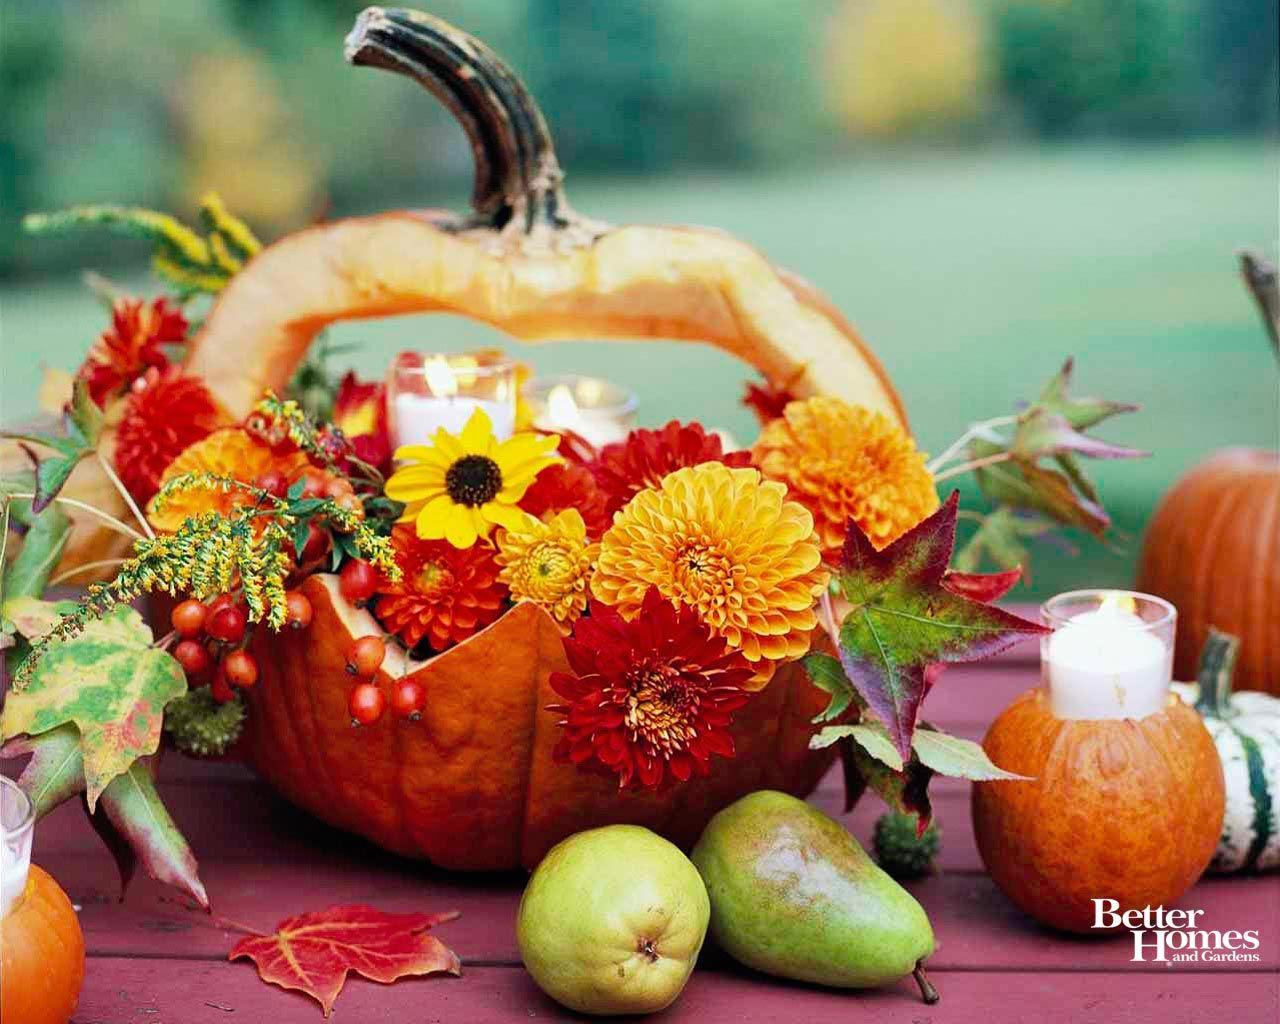 Autumn Pictures With Pumpkins For Desktop